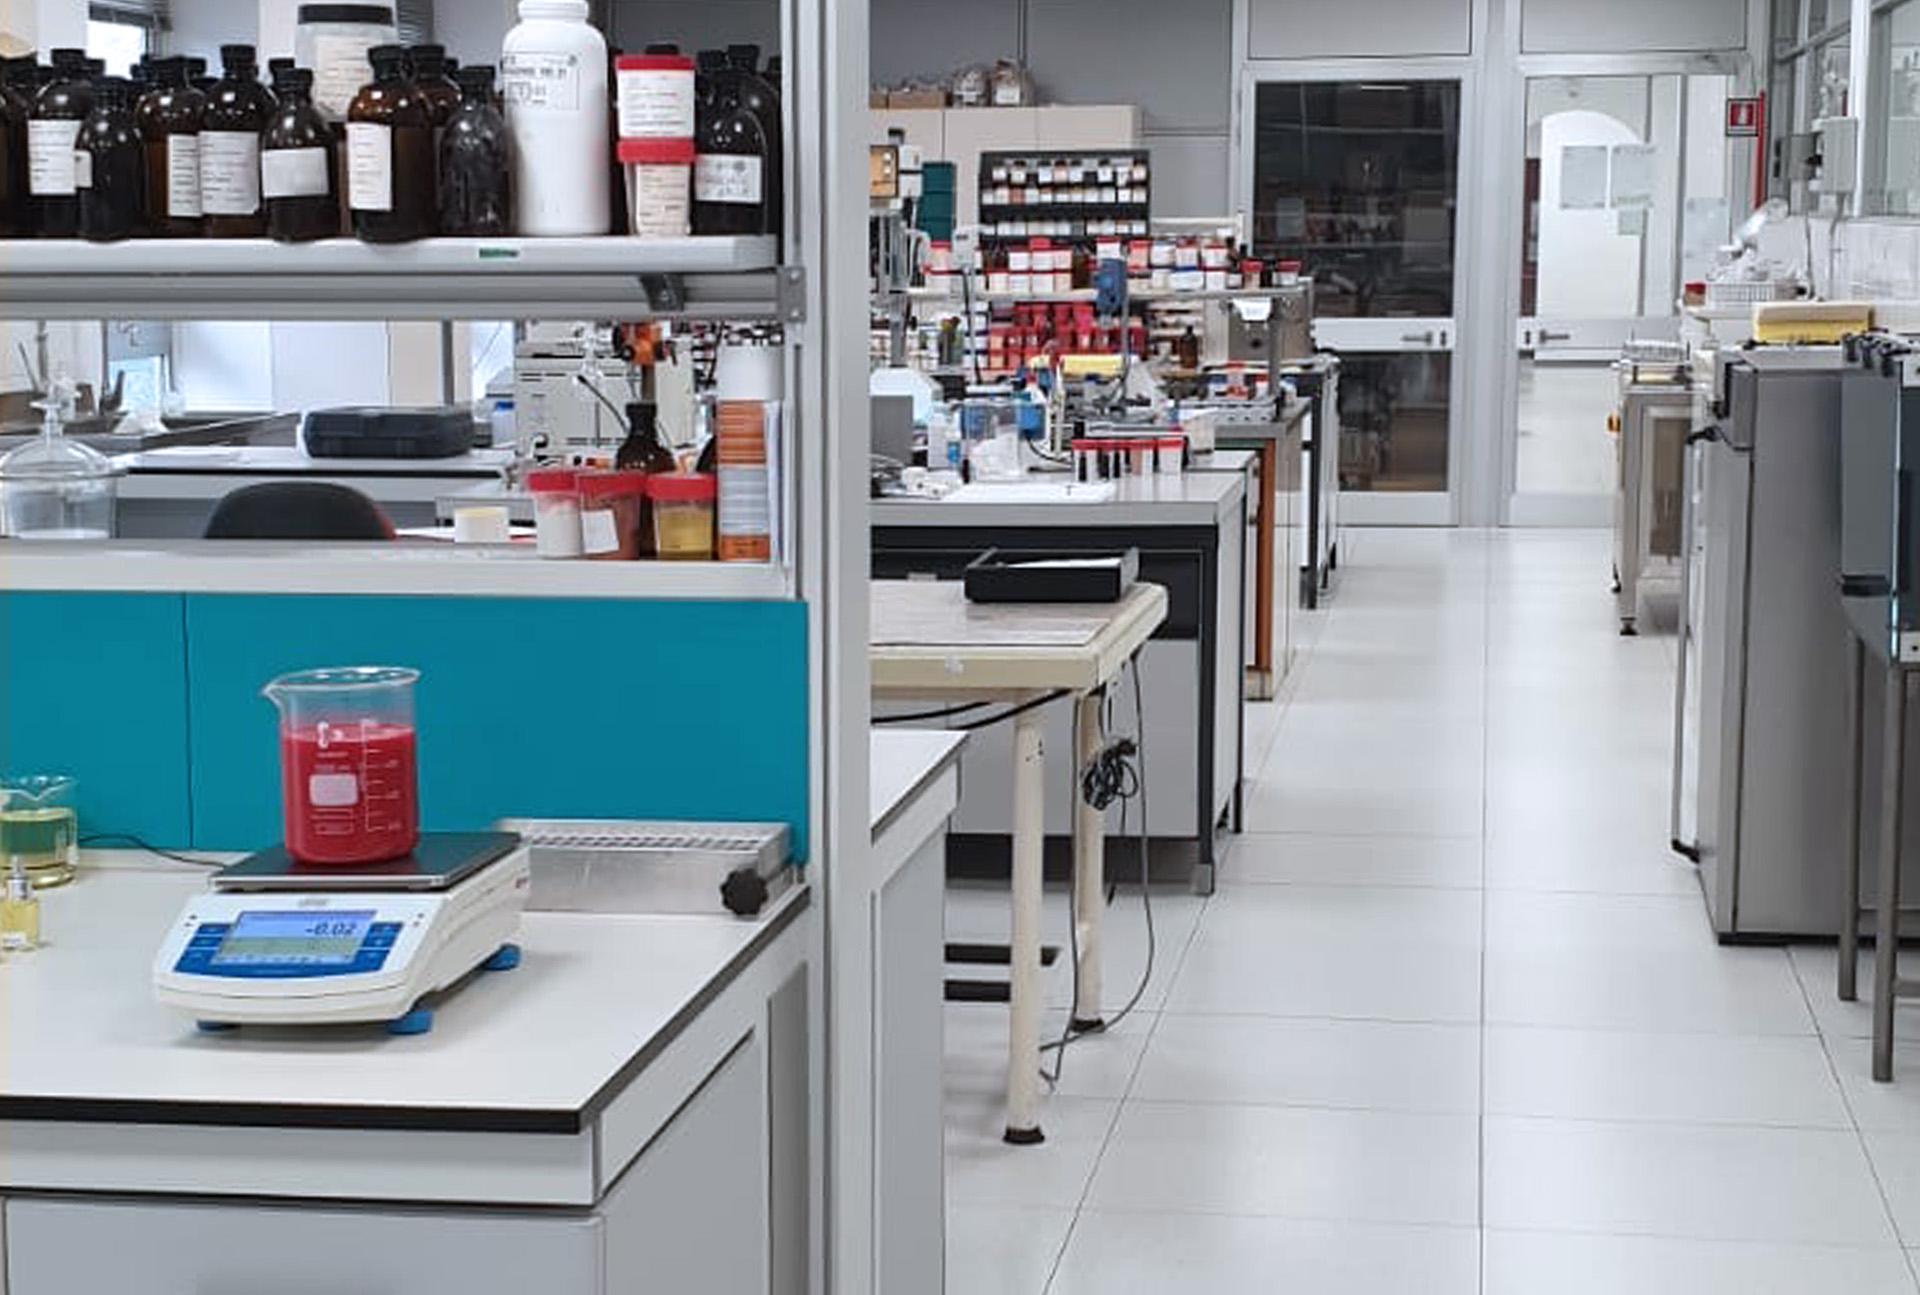 Inca internal laboratory